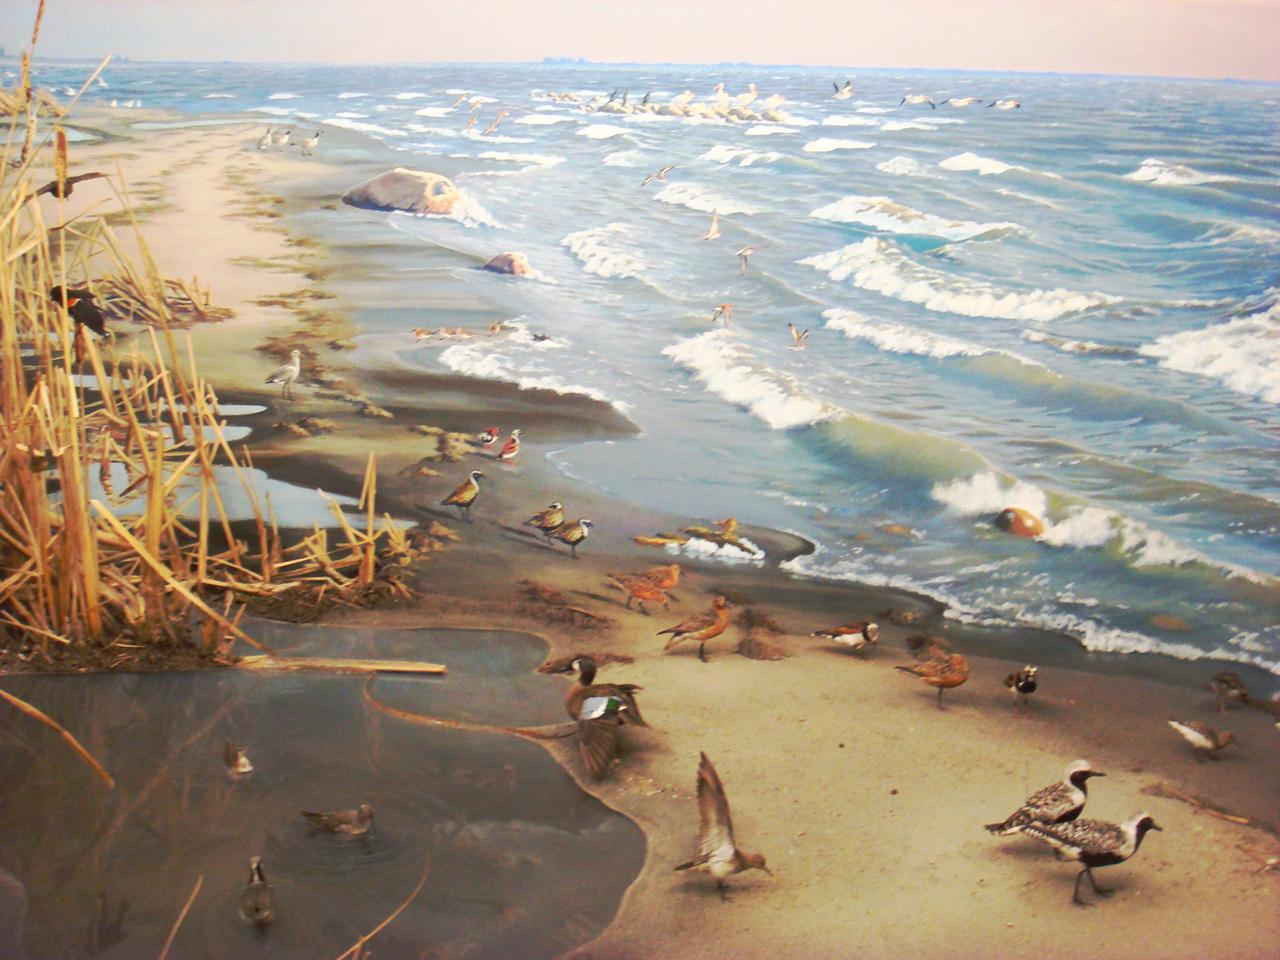 diorama of a Prairie lake with shore birds